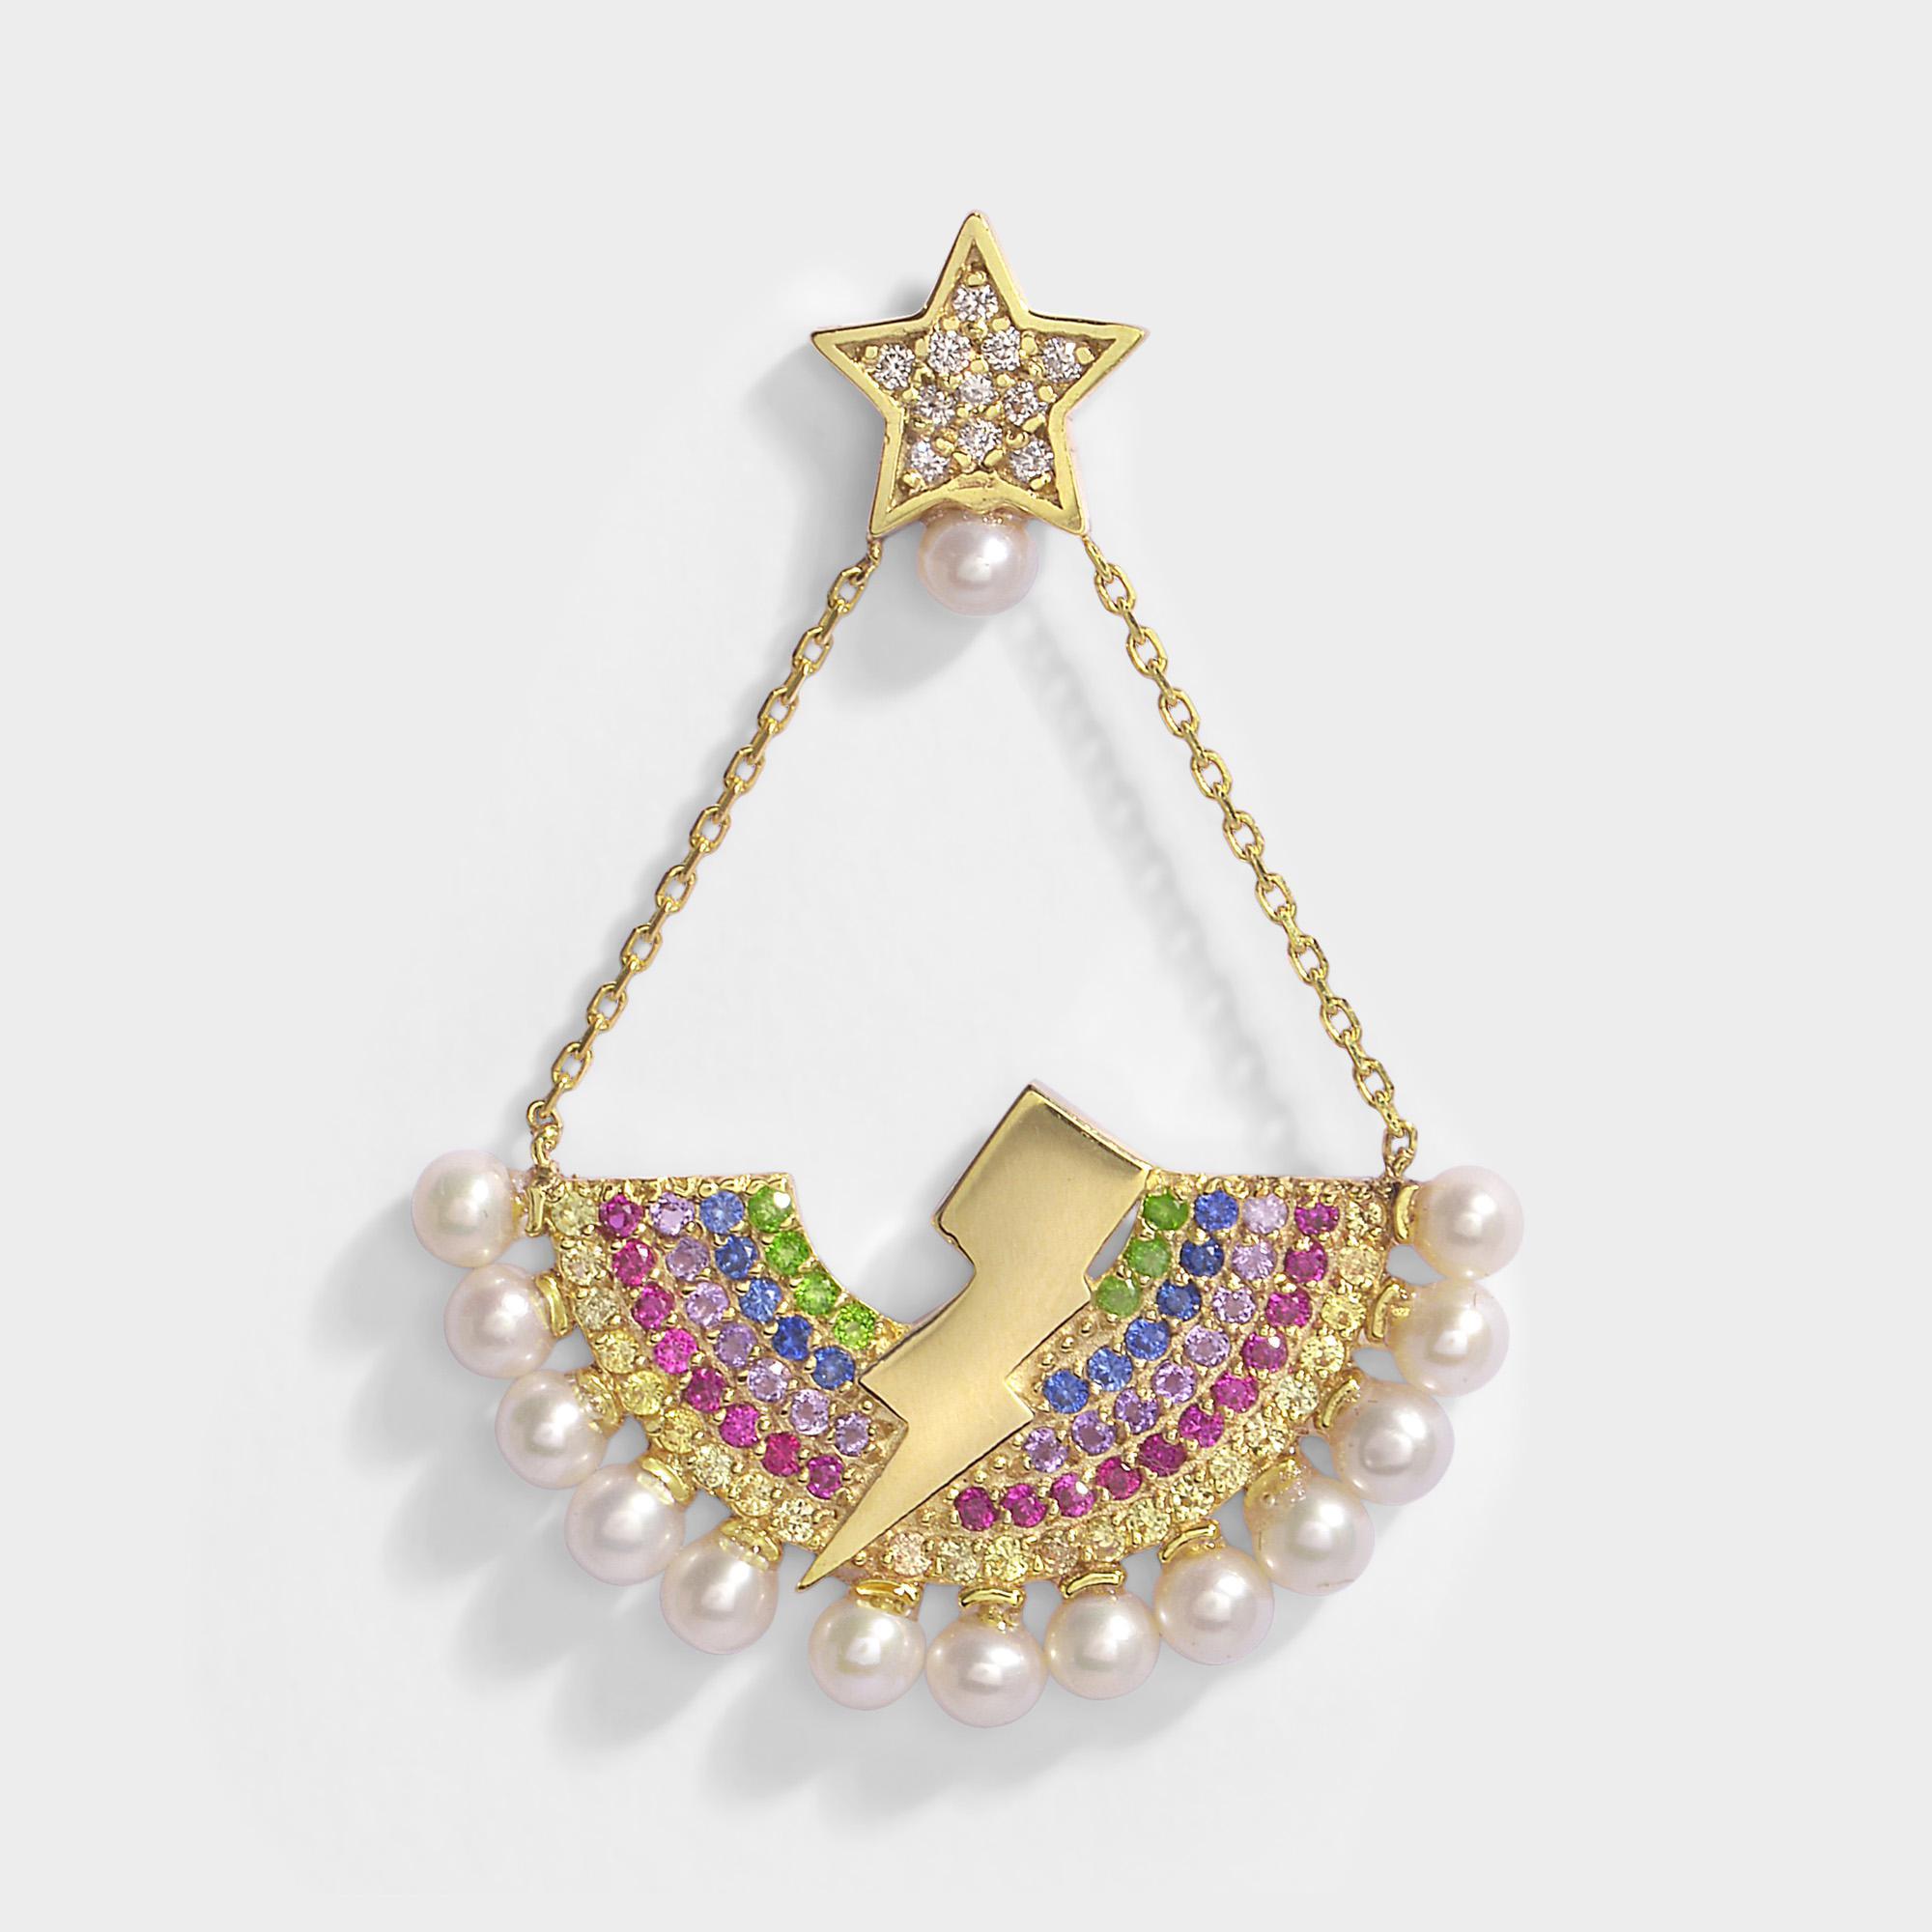 Heart Eating Star Mono Earring in 14K Gold and Diamonds Anton Heunis 8DAw9h